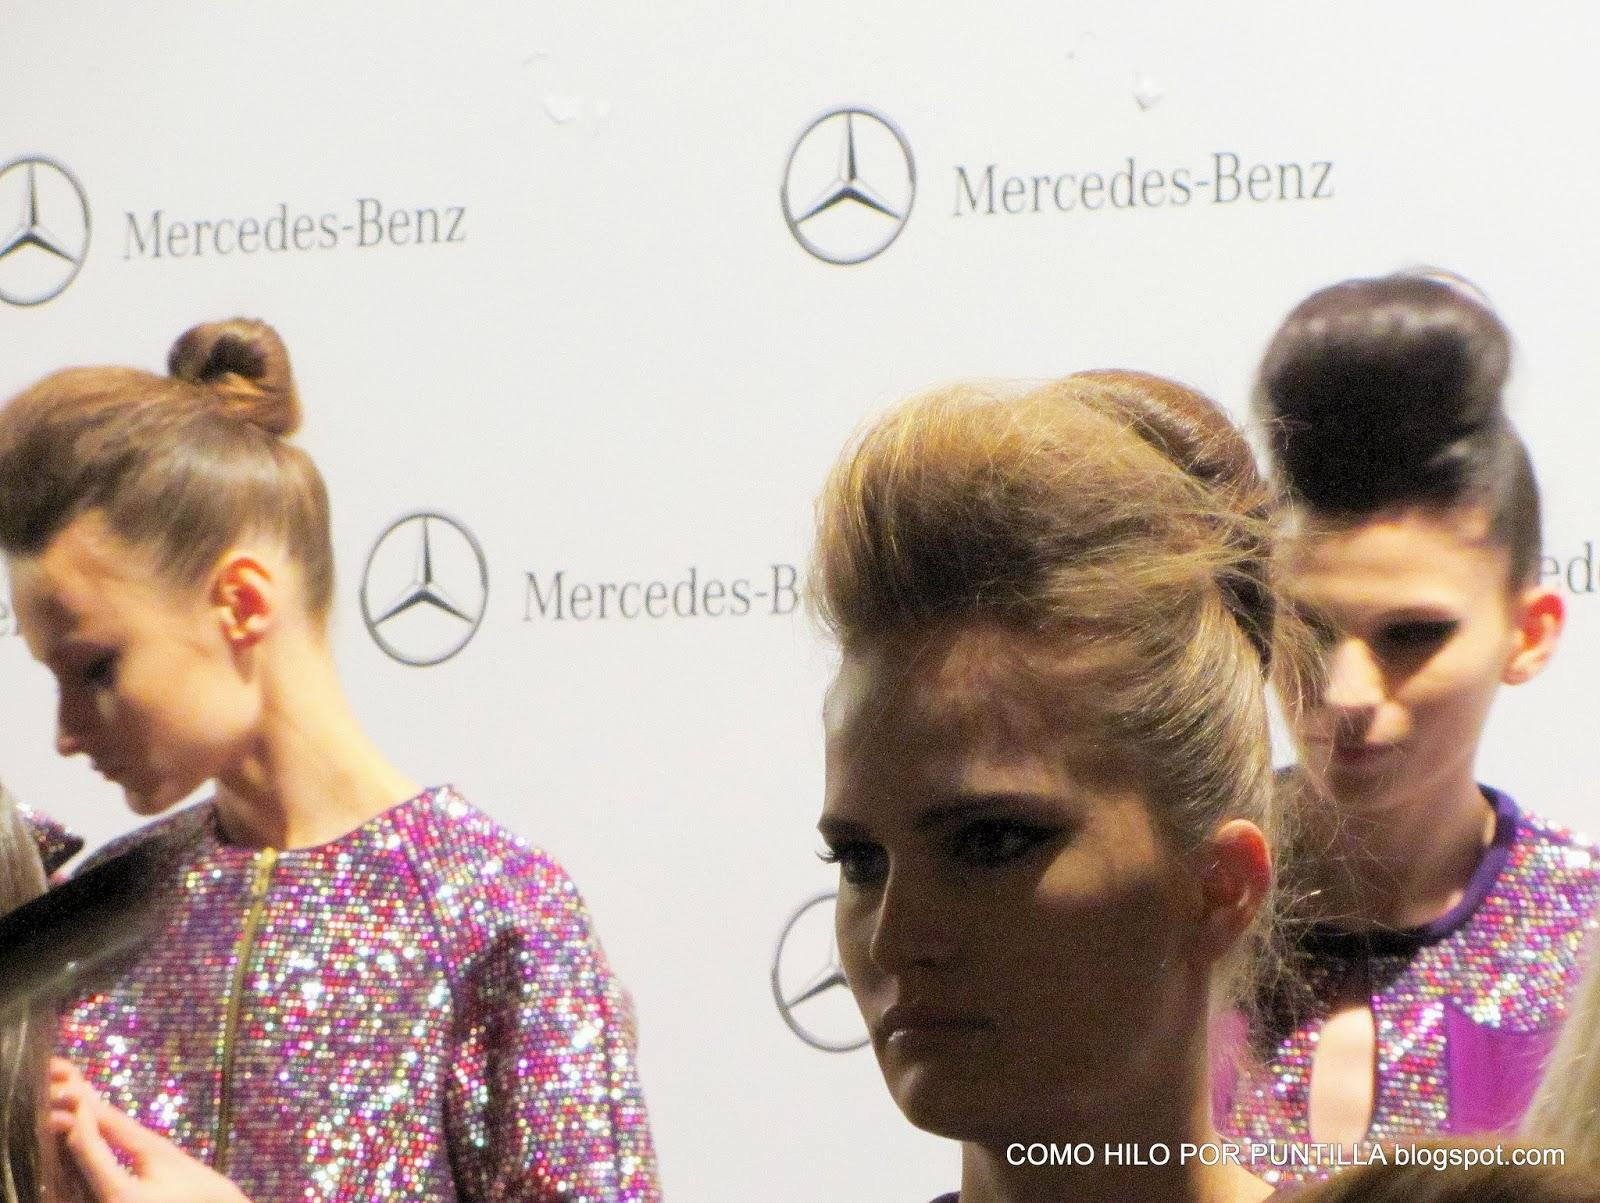 Mercedes-Benz-Fashion-Week-Madrid-backstage-miguel-palacio